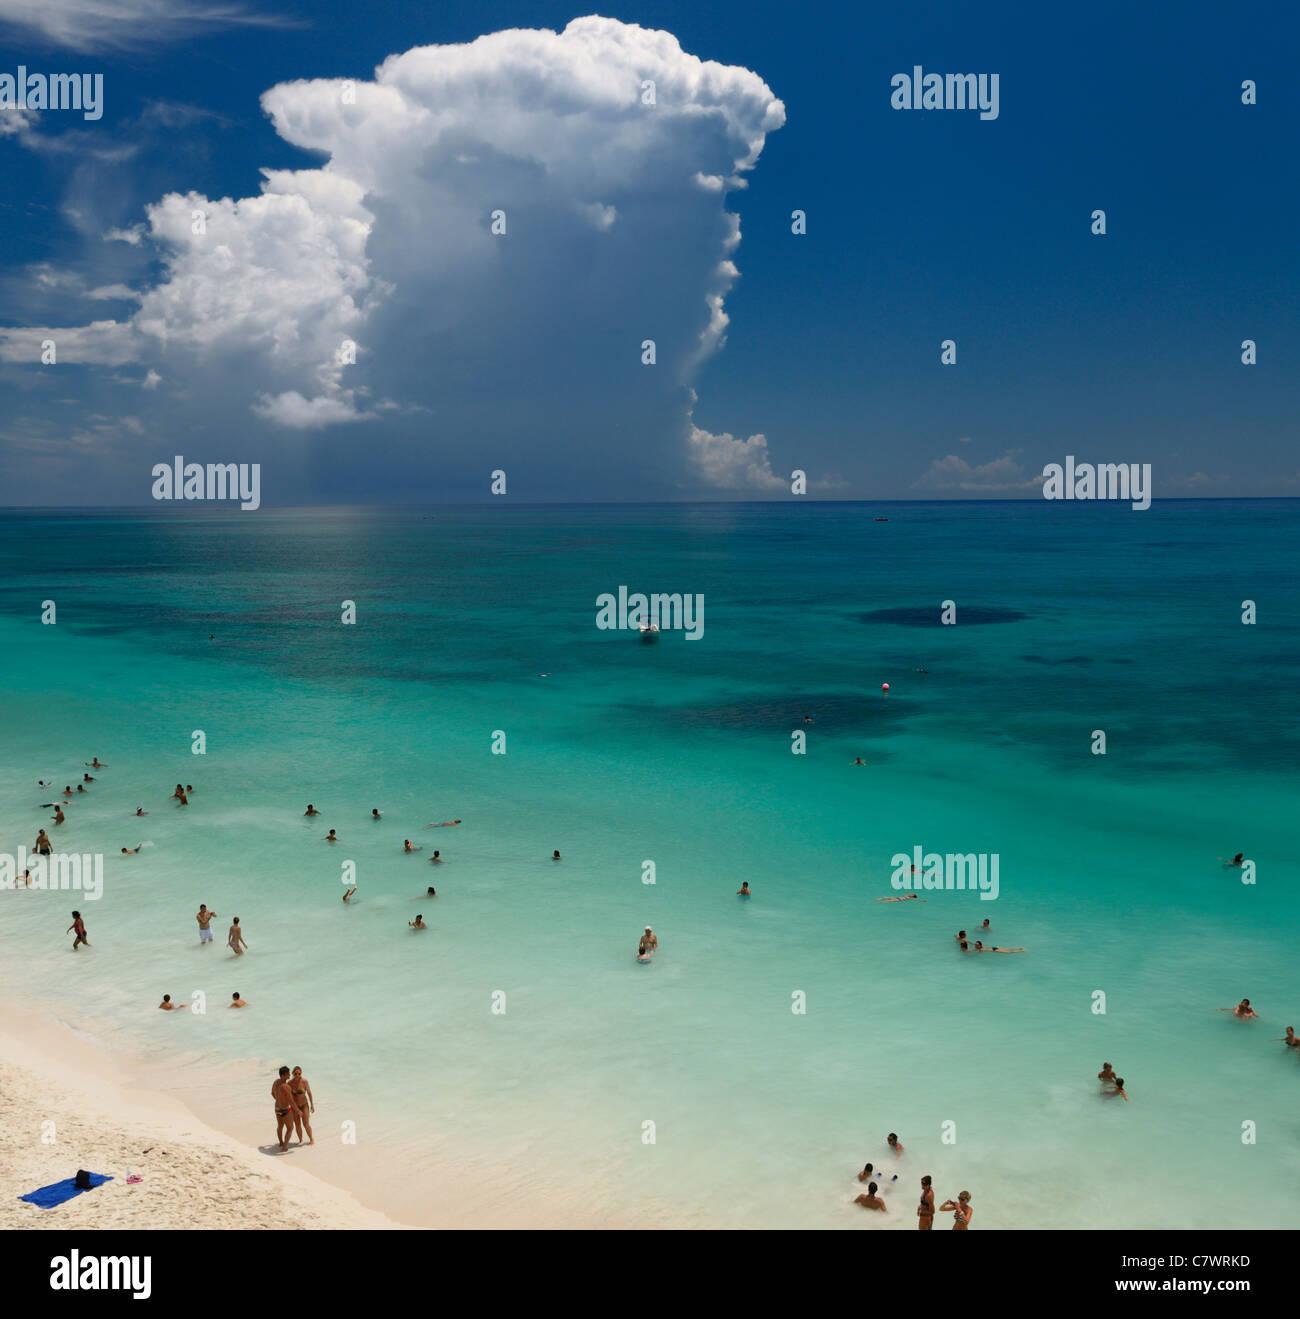 Menge der Badegäste am Strand in Tulum Mexiko im türkisblauen Meer mit Storm cloud Riviera Maya Halbinsel Stockbild